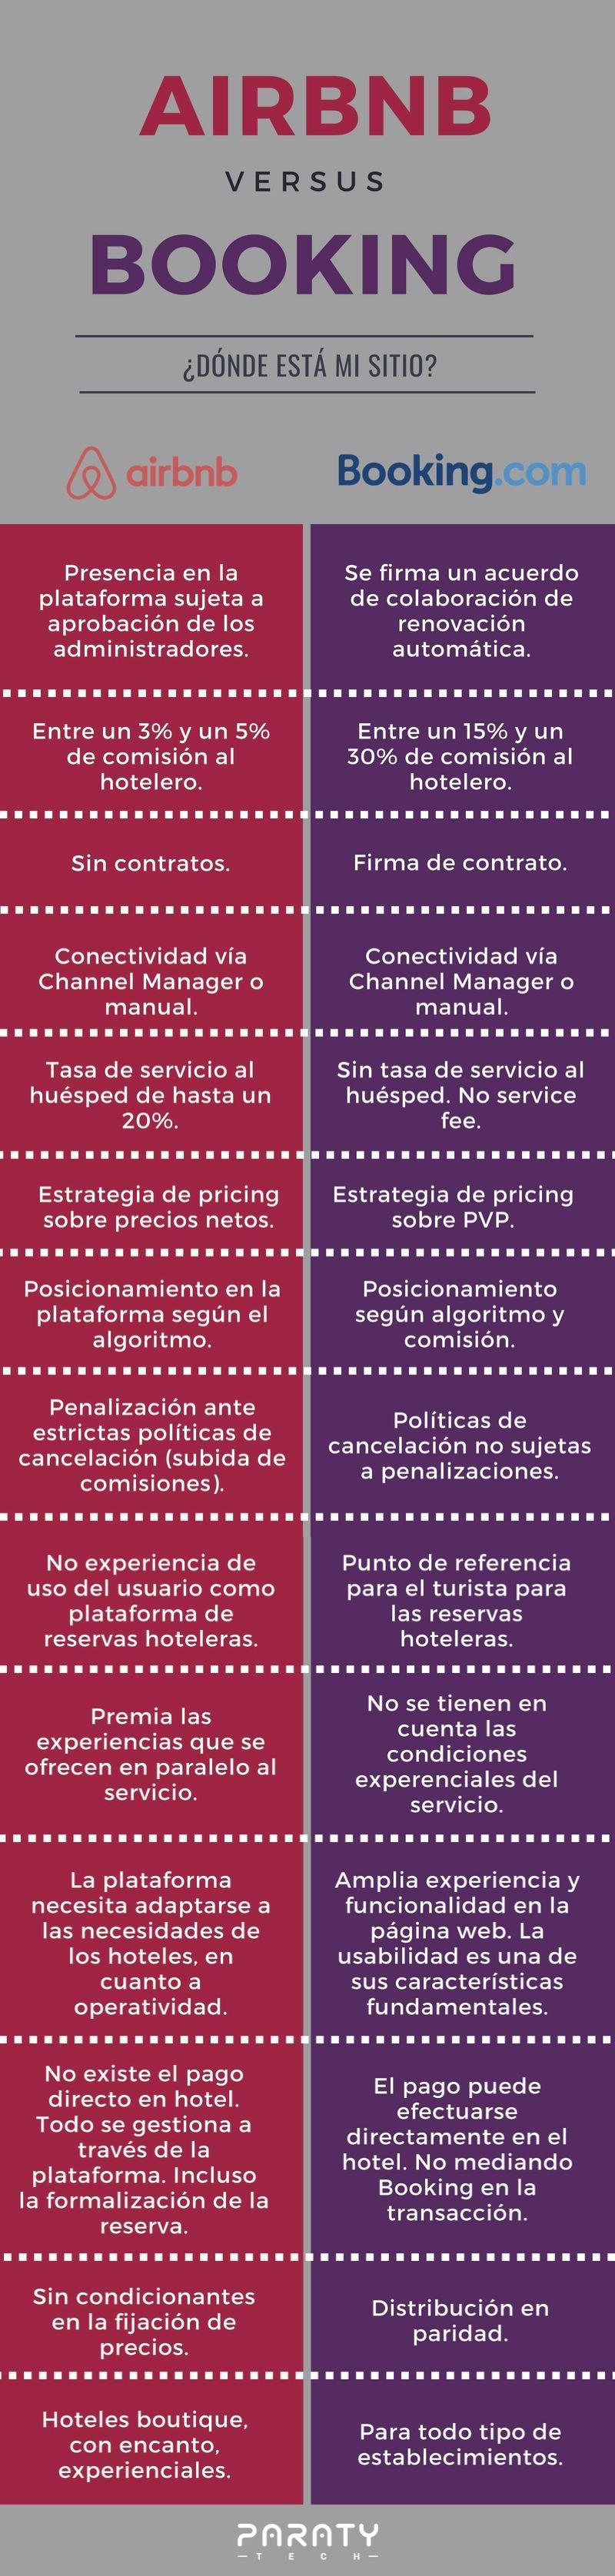 Imagen Airbnb: ventajas e inconvenientes como canal de distribución hotelera